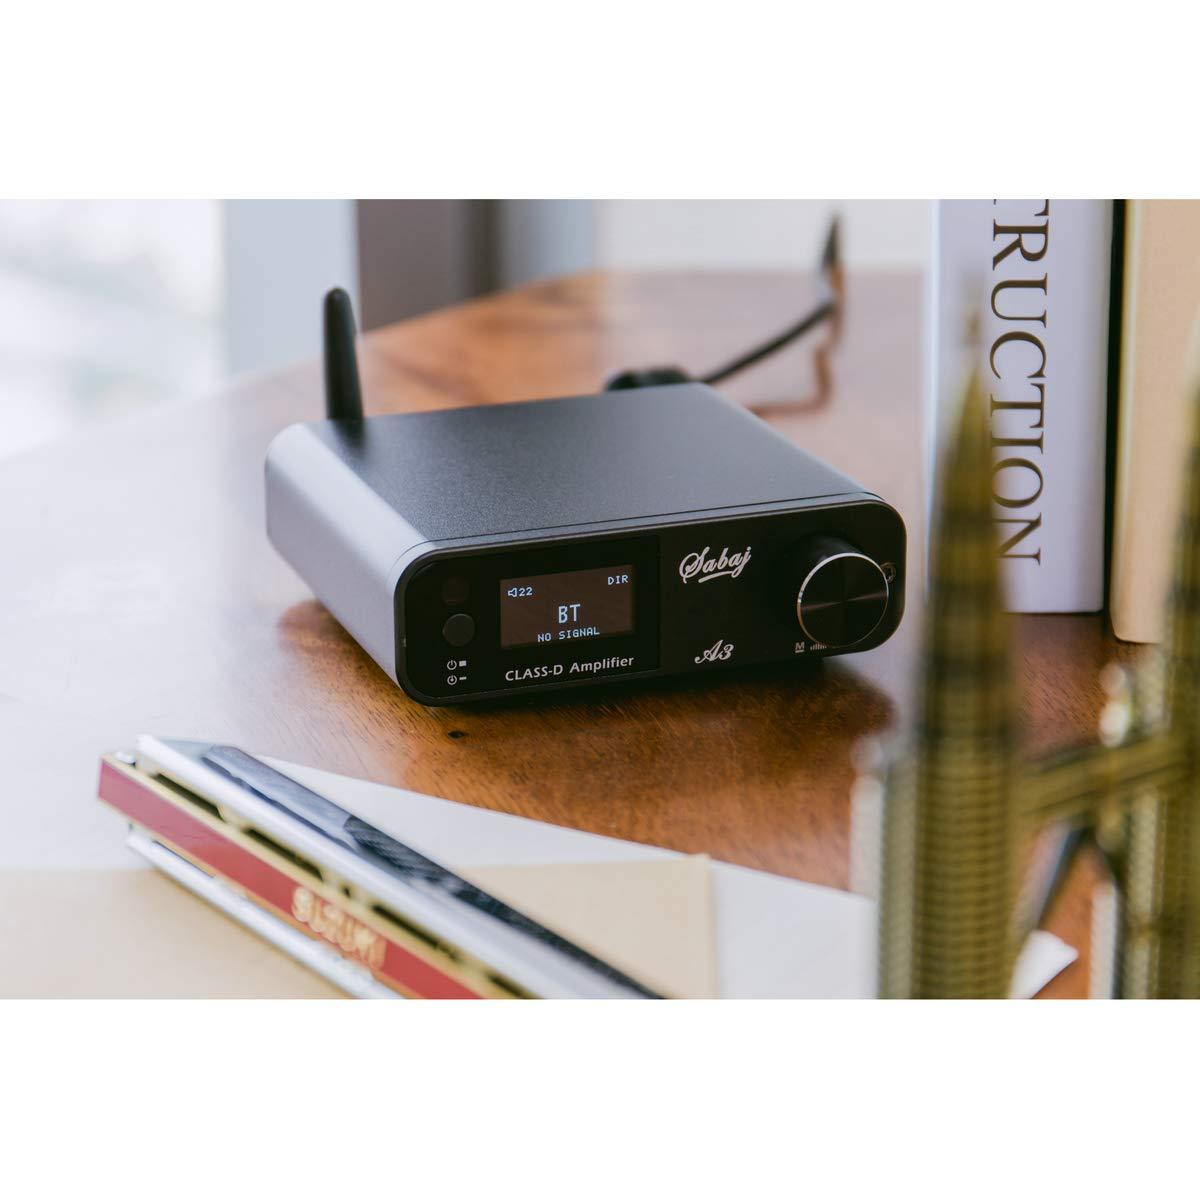 Unbekannt Compacto Sistema est/éreo de Alta fidelidad dise/ño Multimedia Mini Bluetooth est/éreo